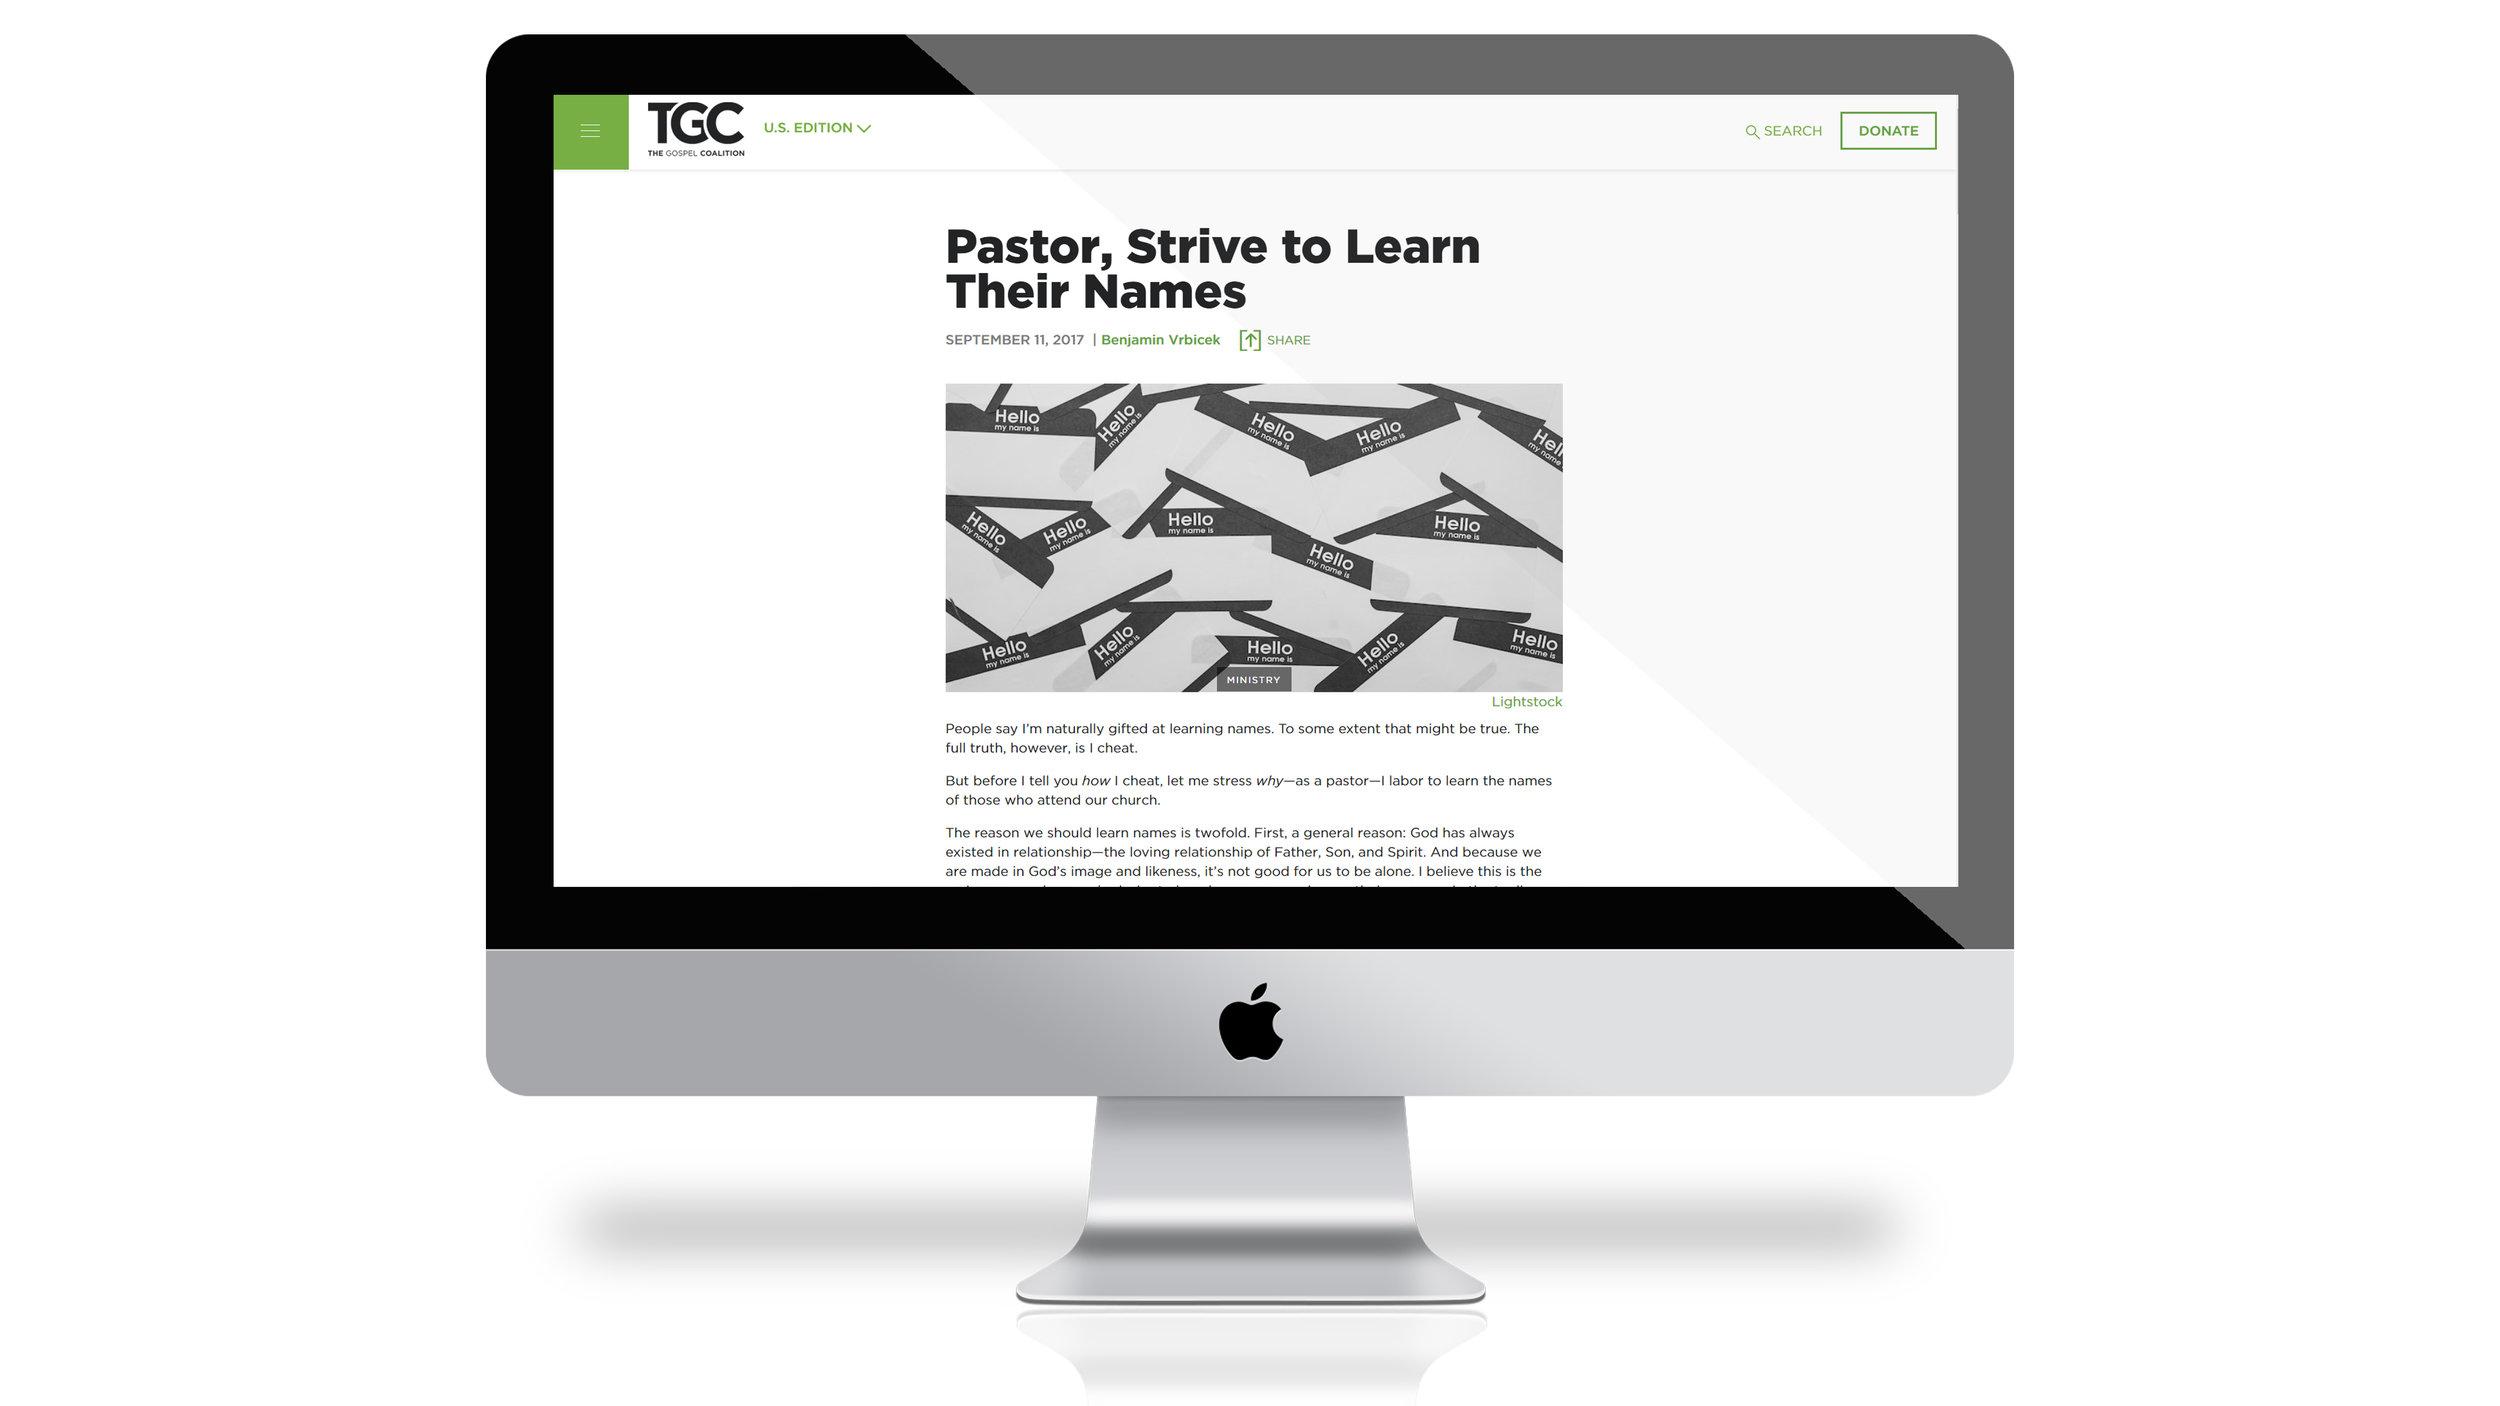 iMac, mockup, TGC1.jpg